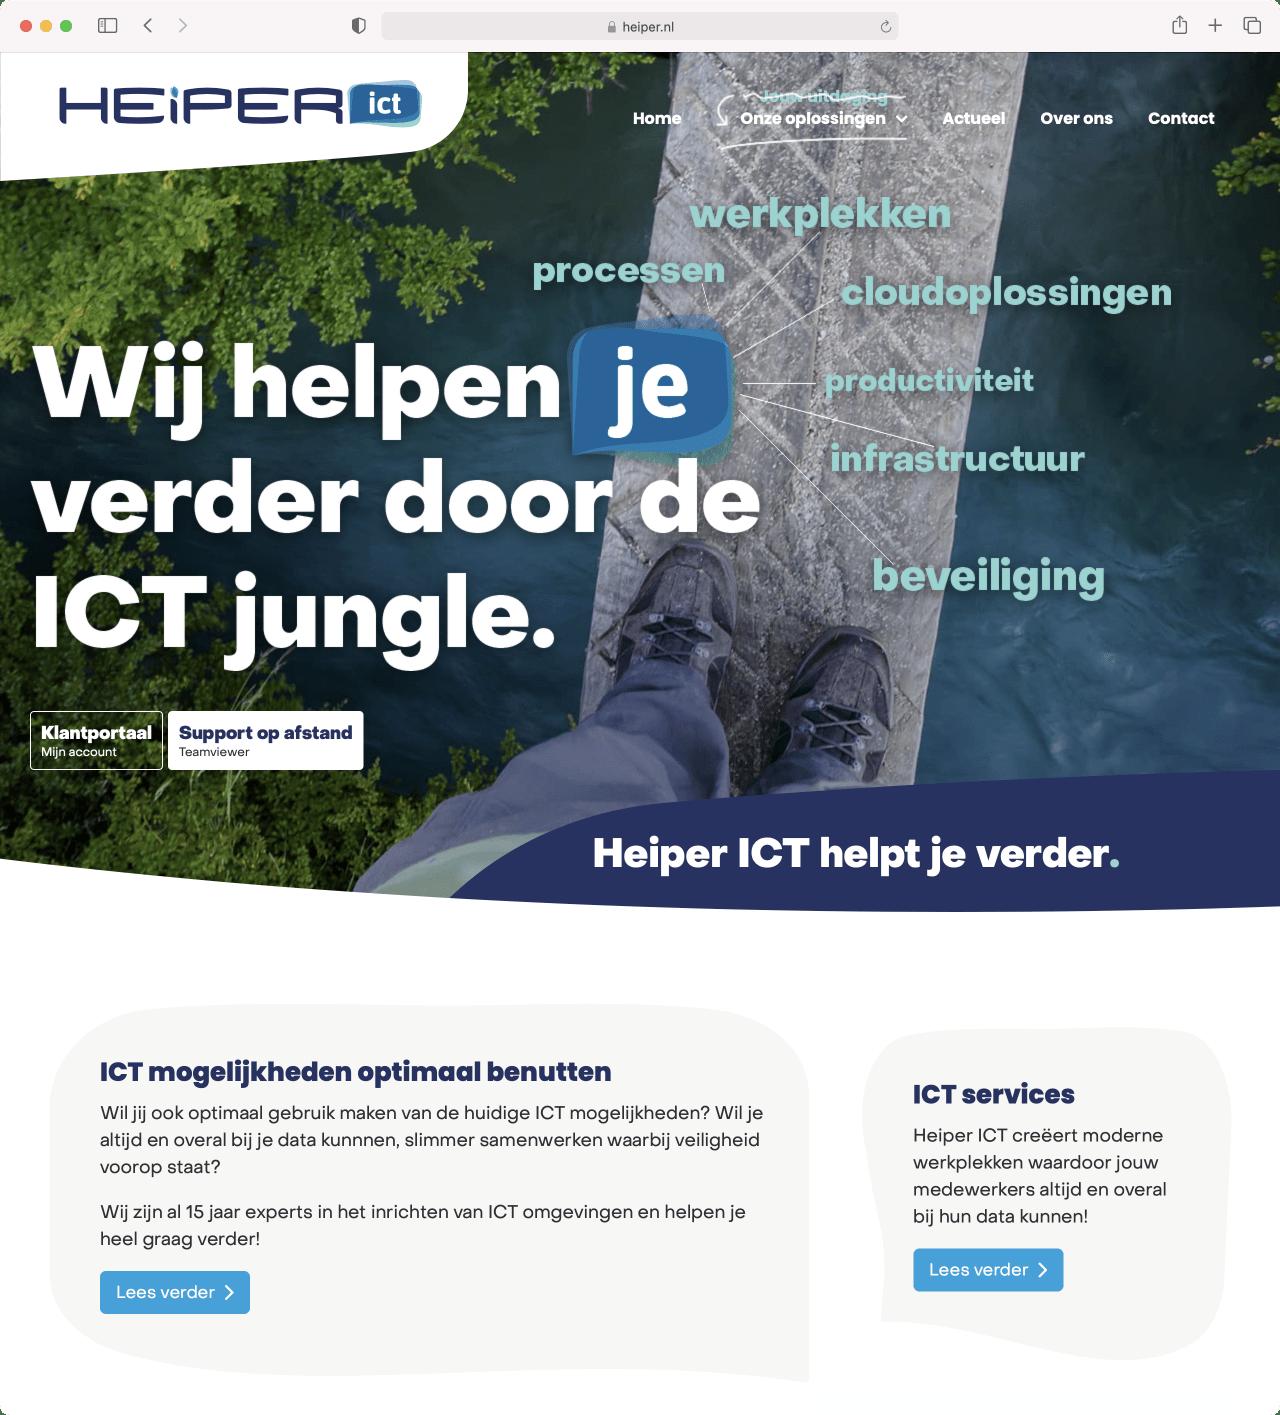 Heiper ICT